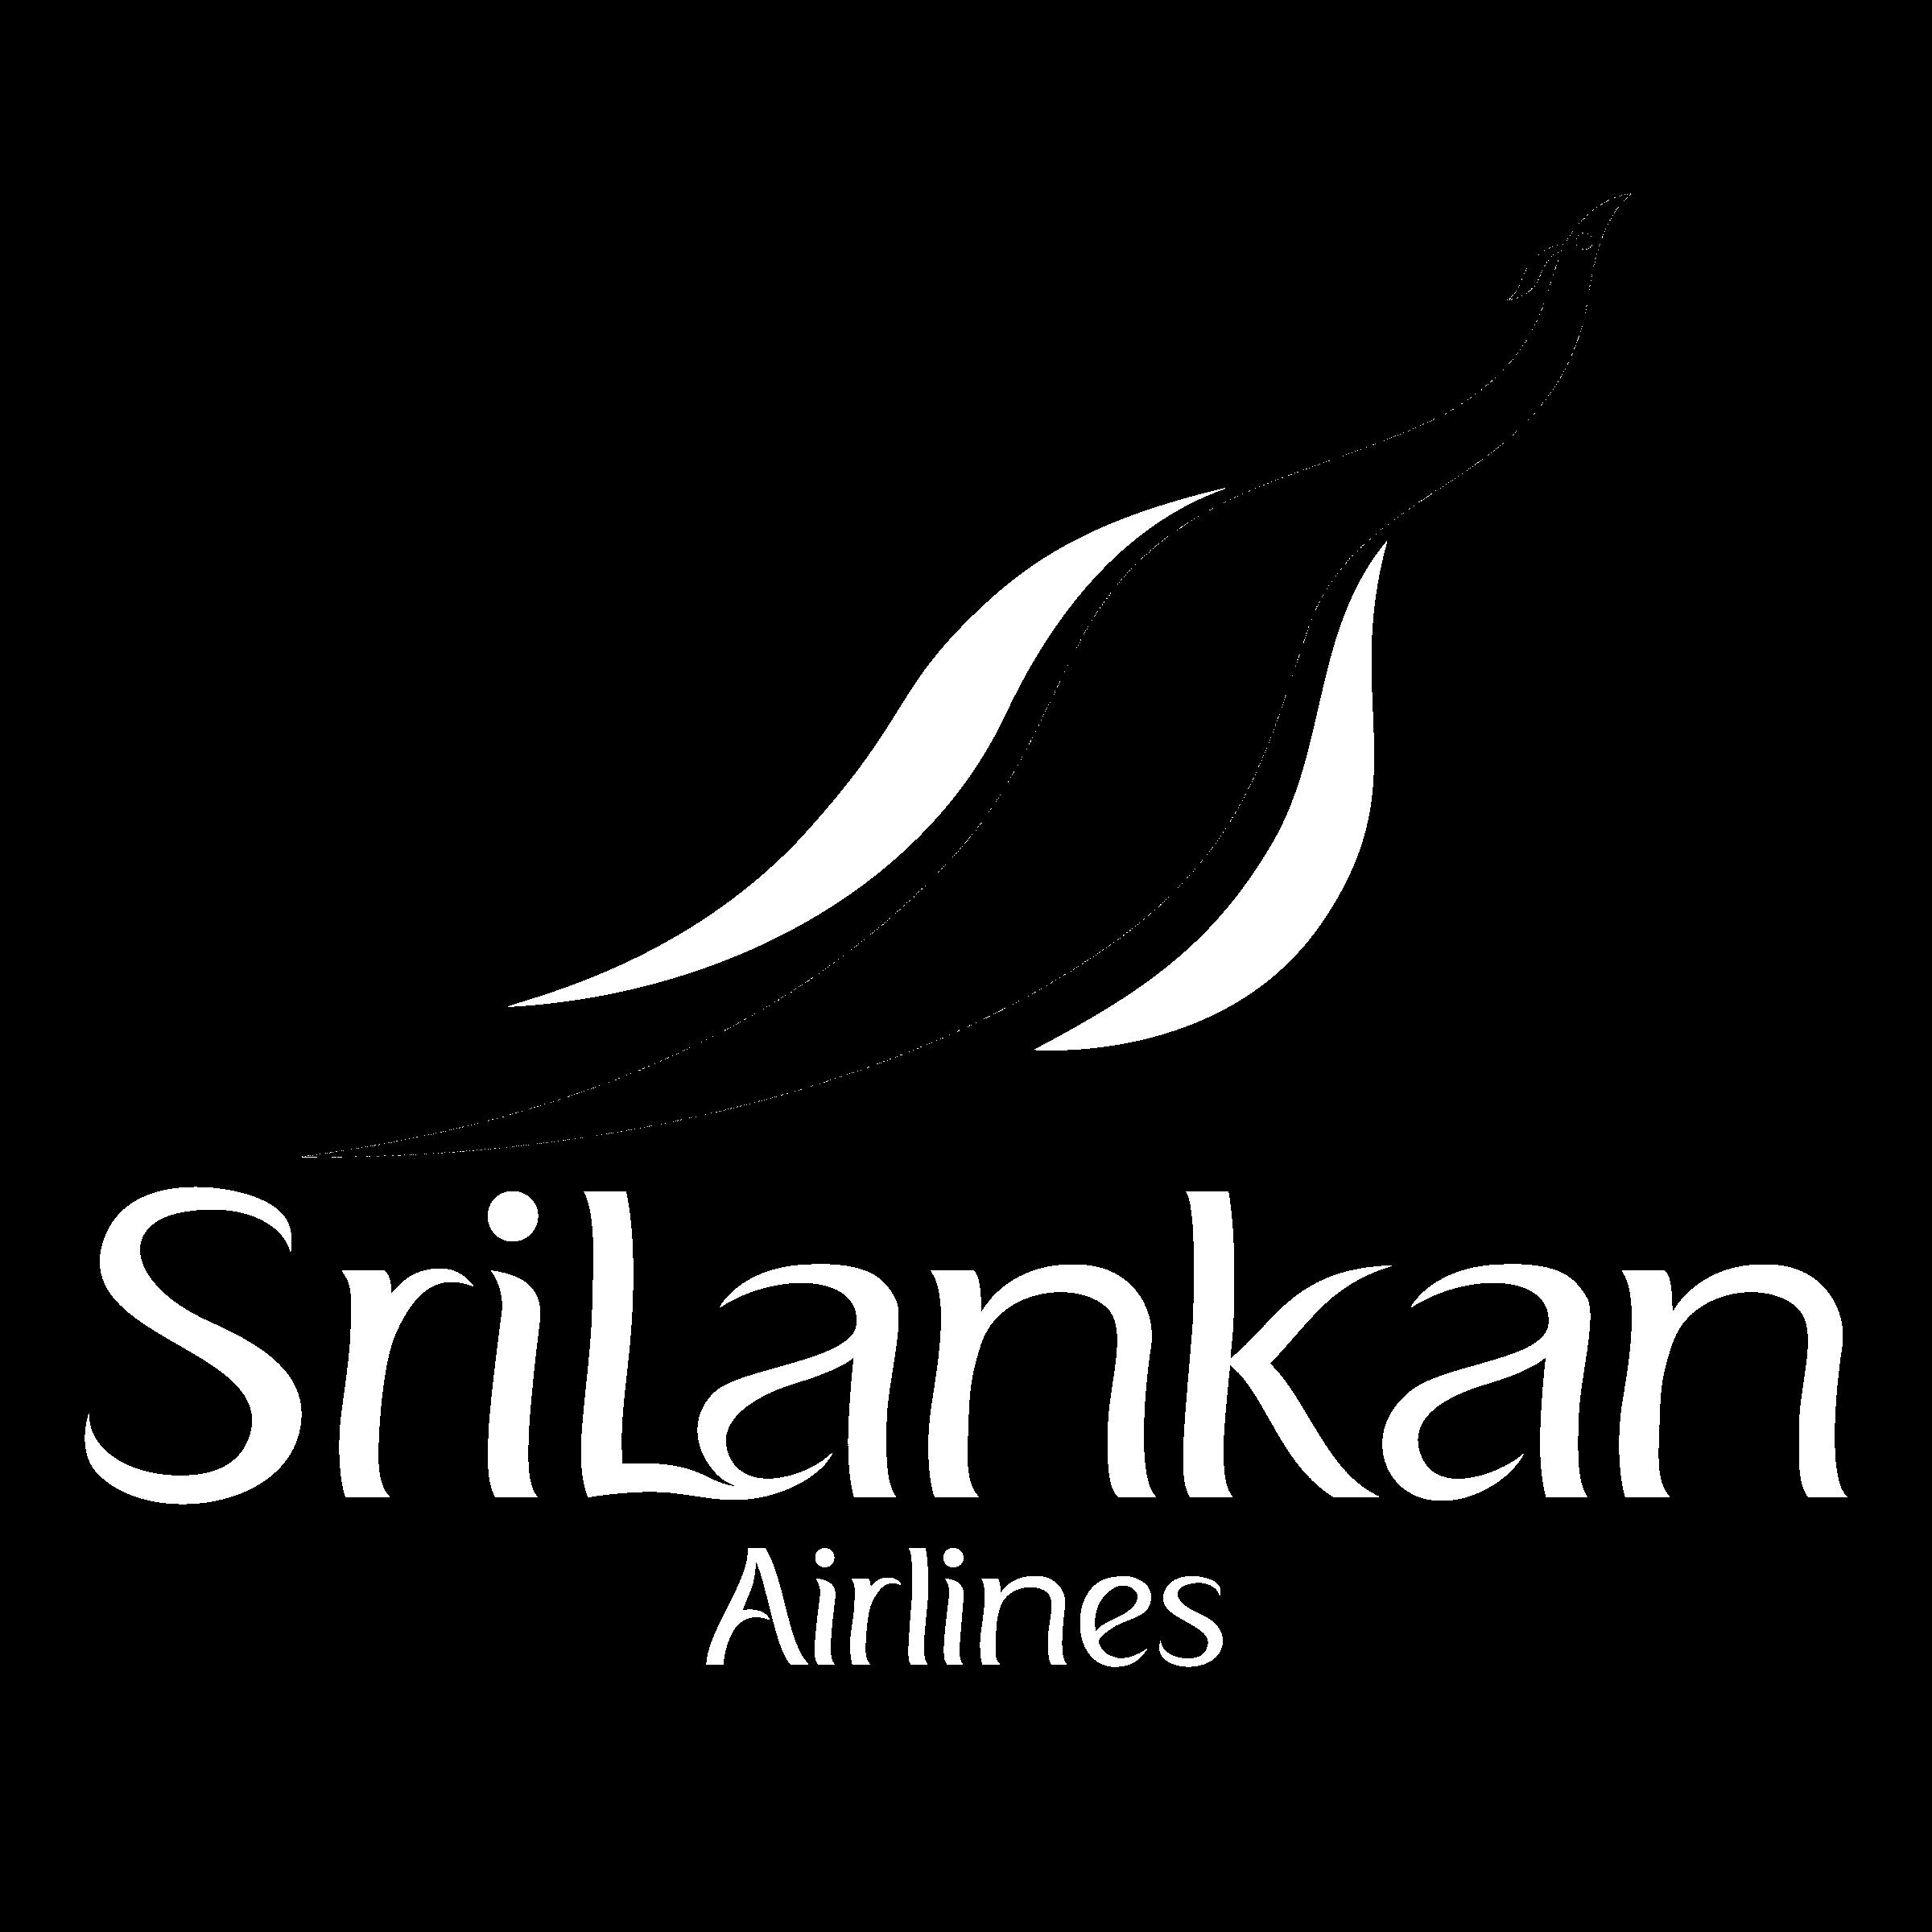 Sri Lankan Airlines Logo PNG Transparent & SVG Vector.